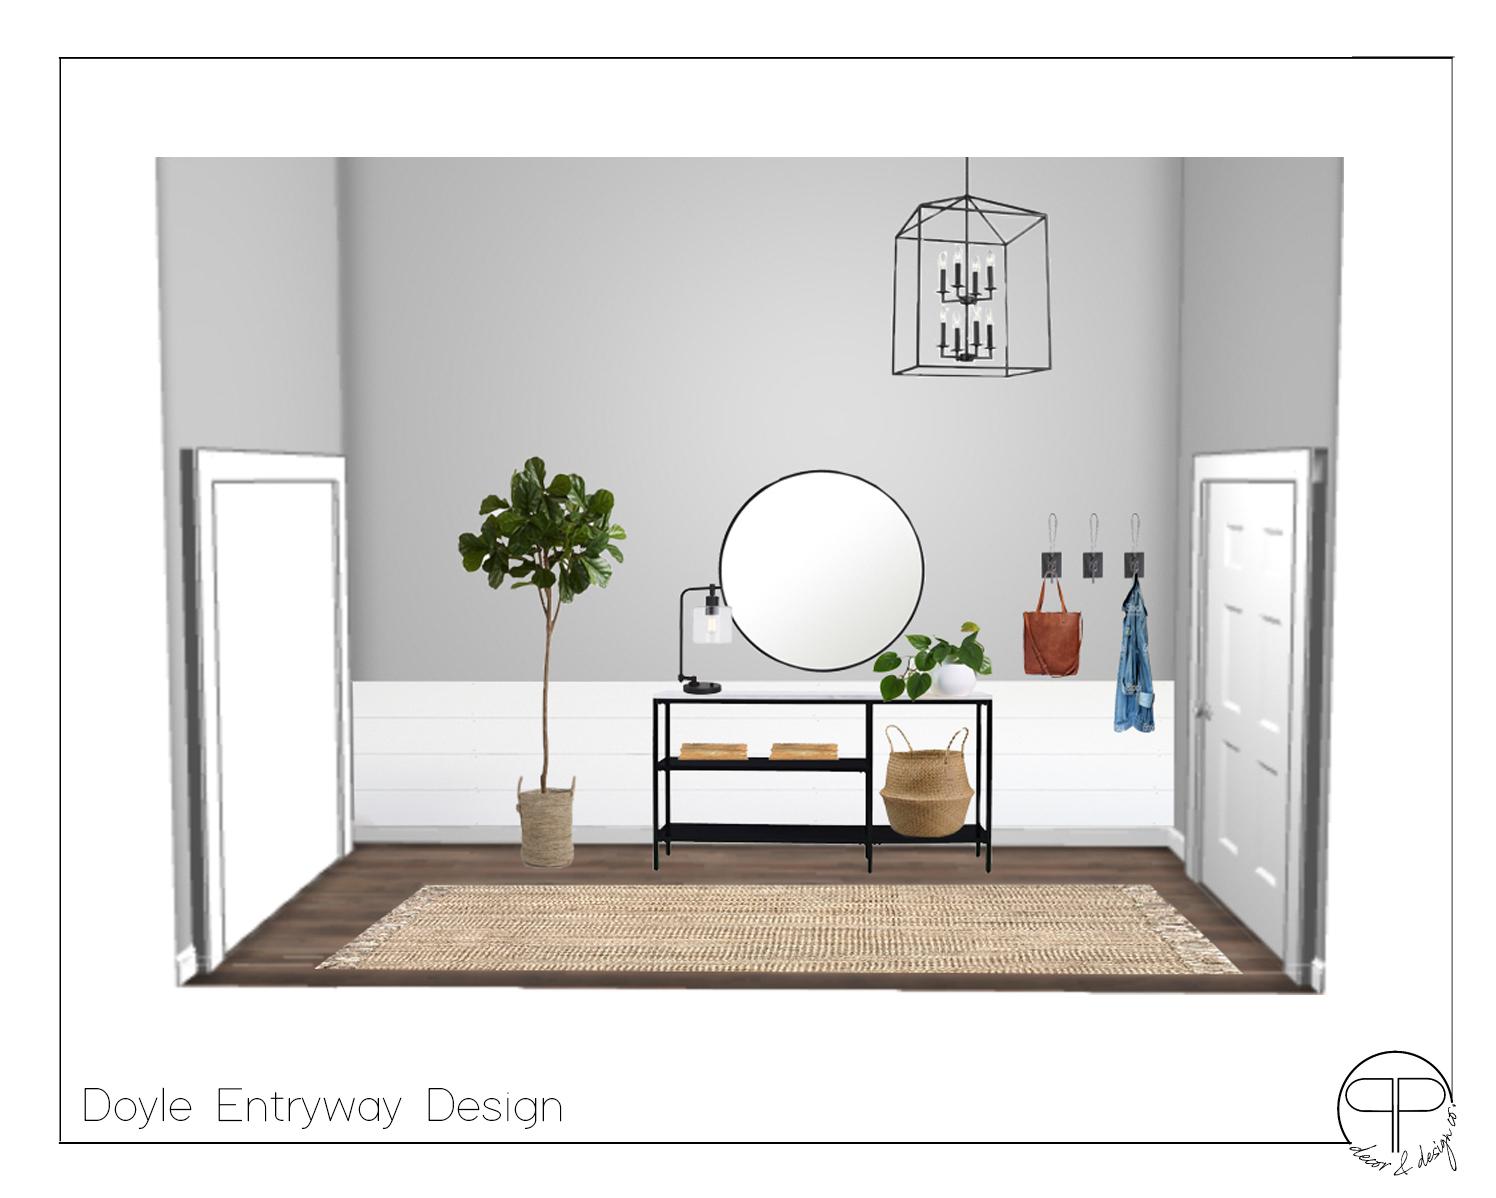 Doyle_Entryway_Design_1.jpg